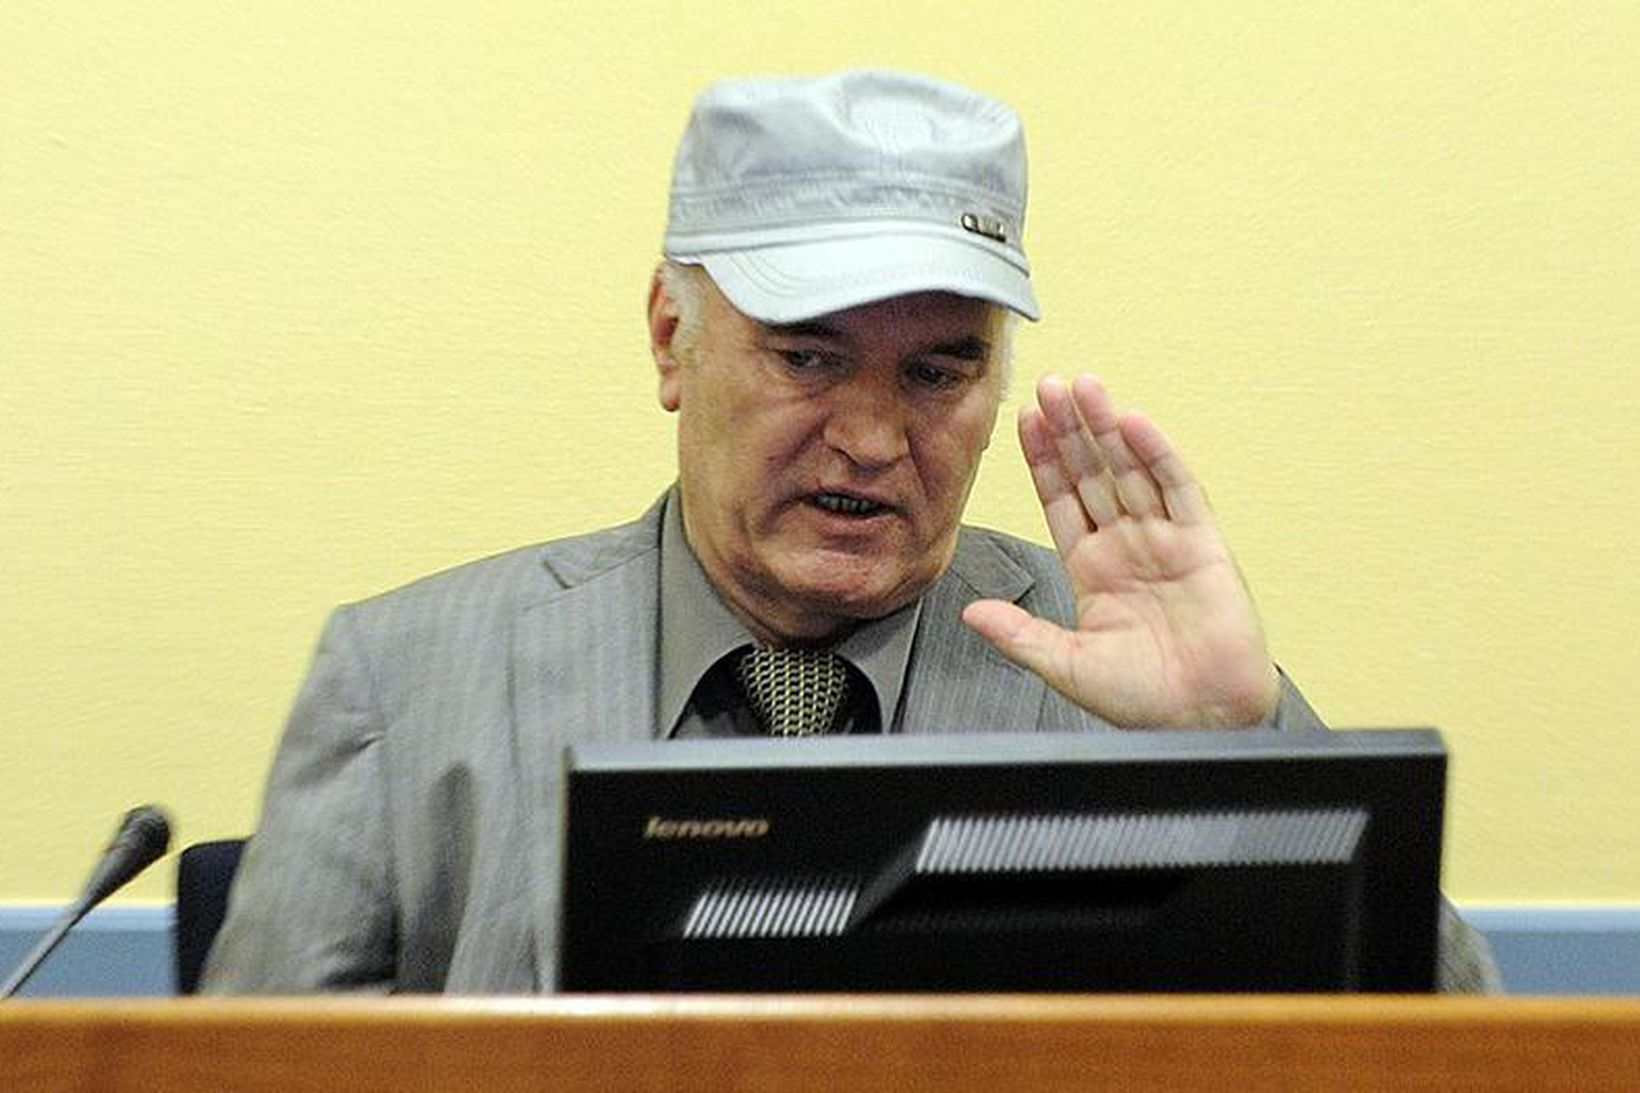 Bosníu-Serbinn Ratko Mladic.